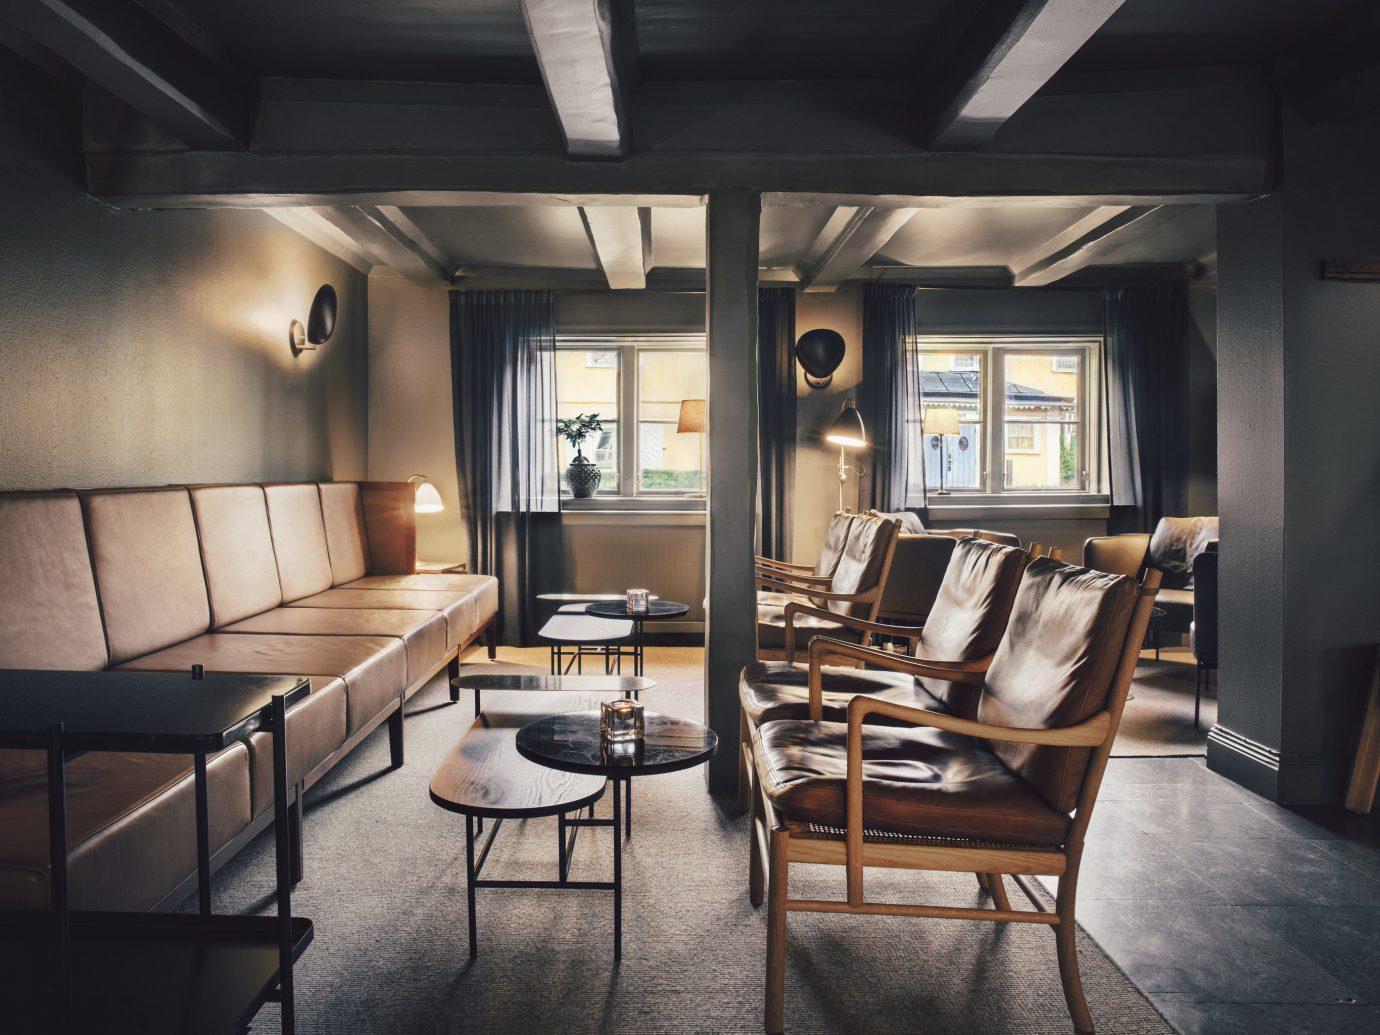 Hotels Stockholm Sweden floor indoor chair room interior design ceiling furniture table living room loft window interior designer